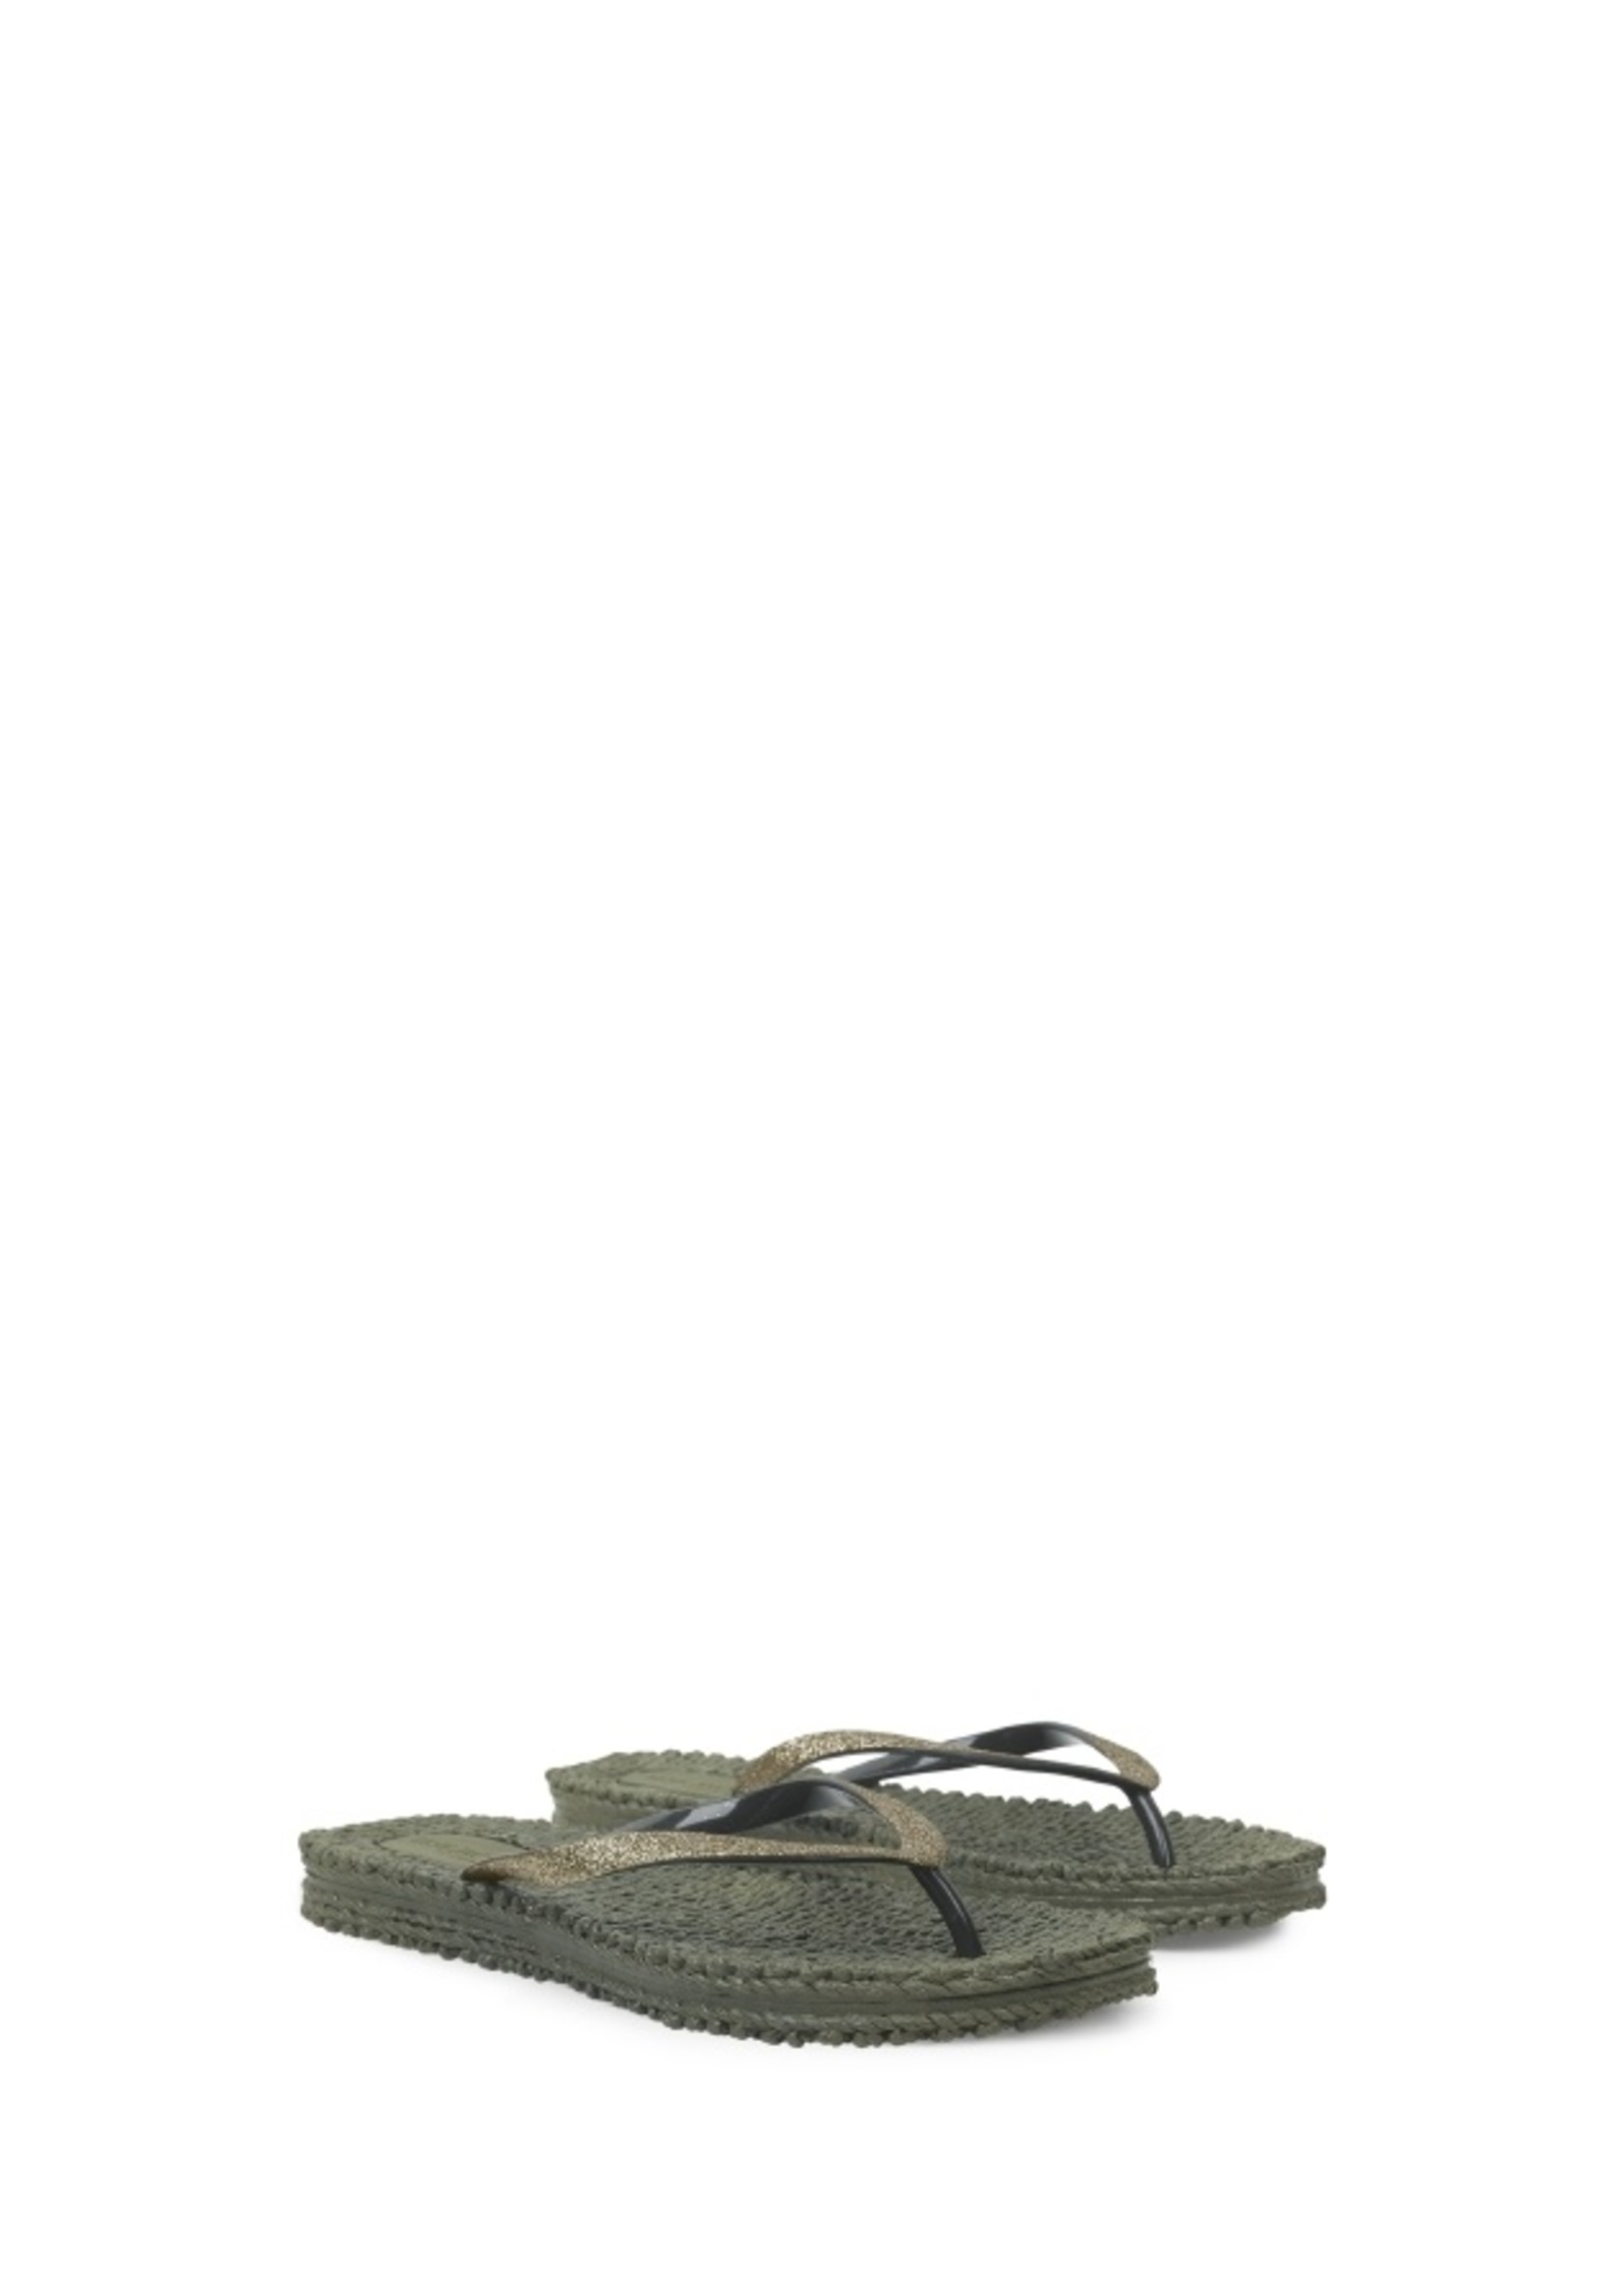 Ilse Jacobsen Cheerful Flip Flop - Army 39